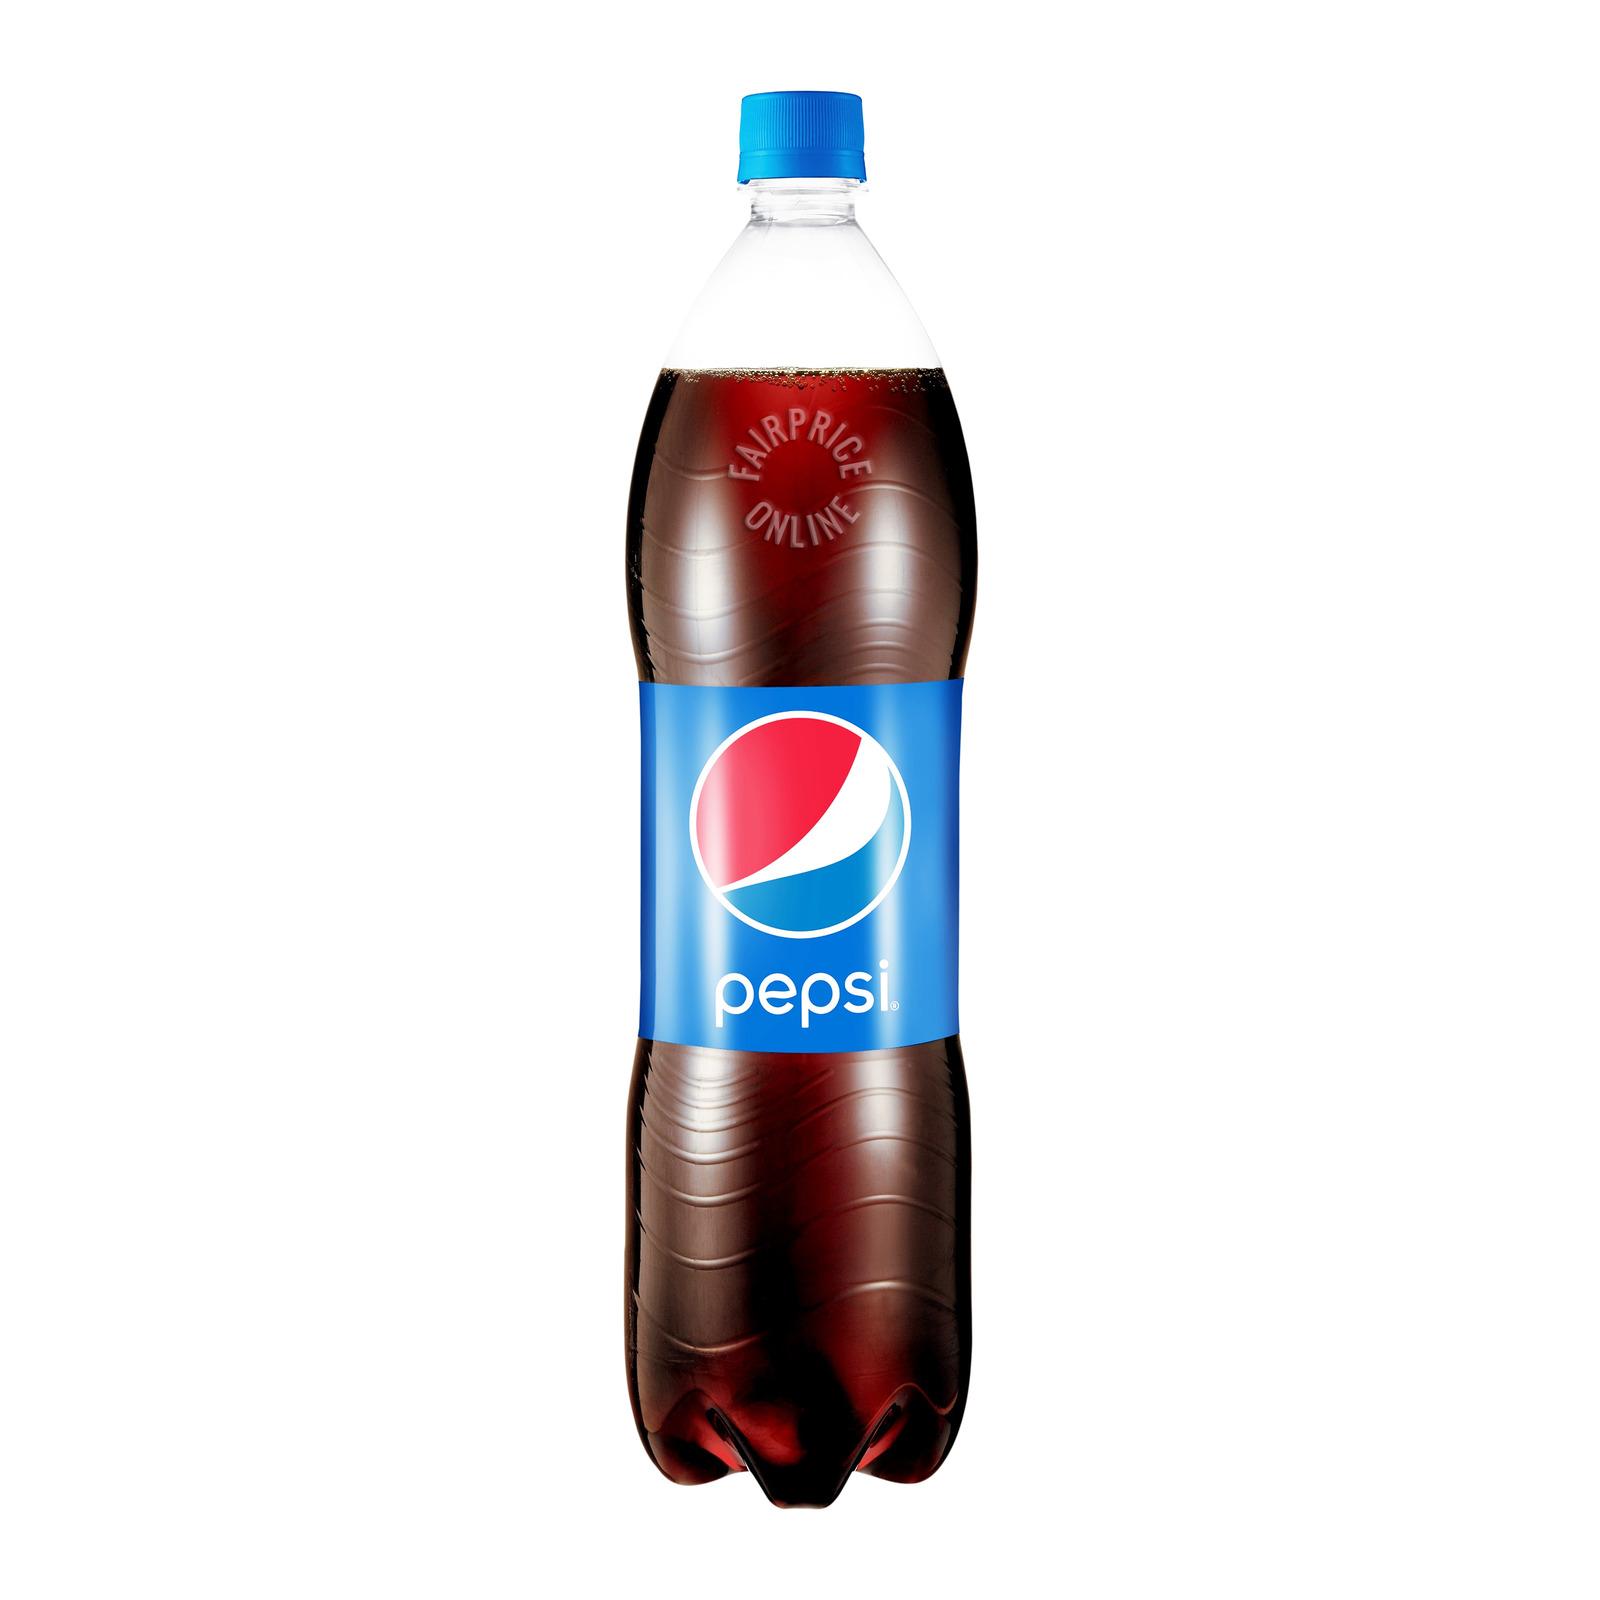 Pepsi Bottle Drink